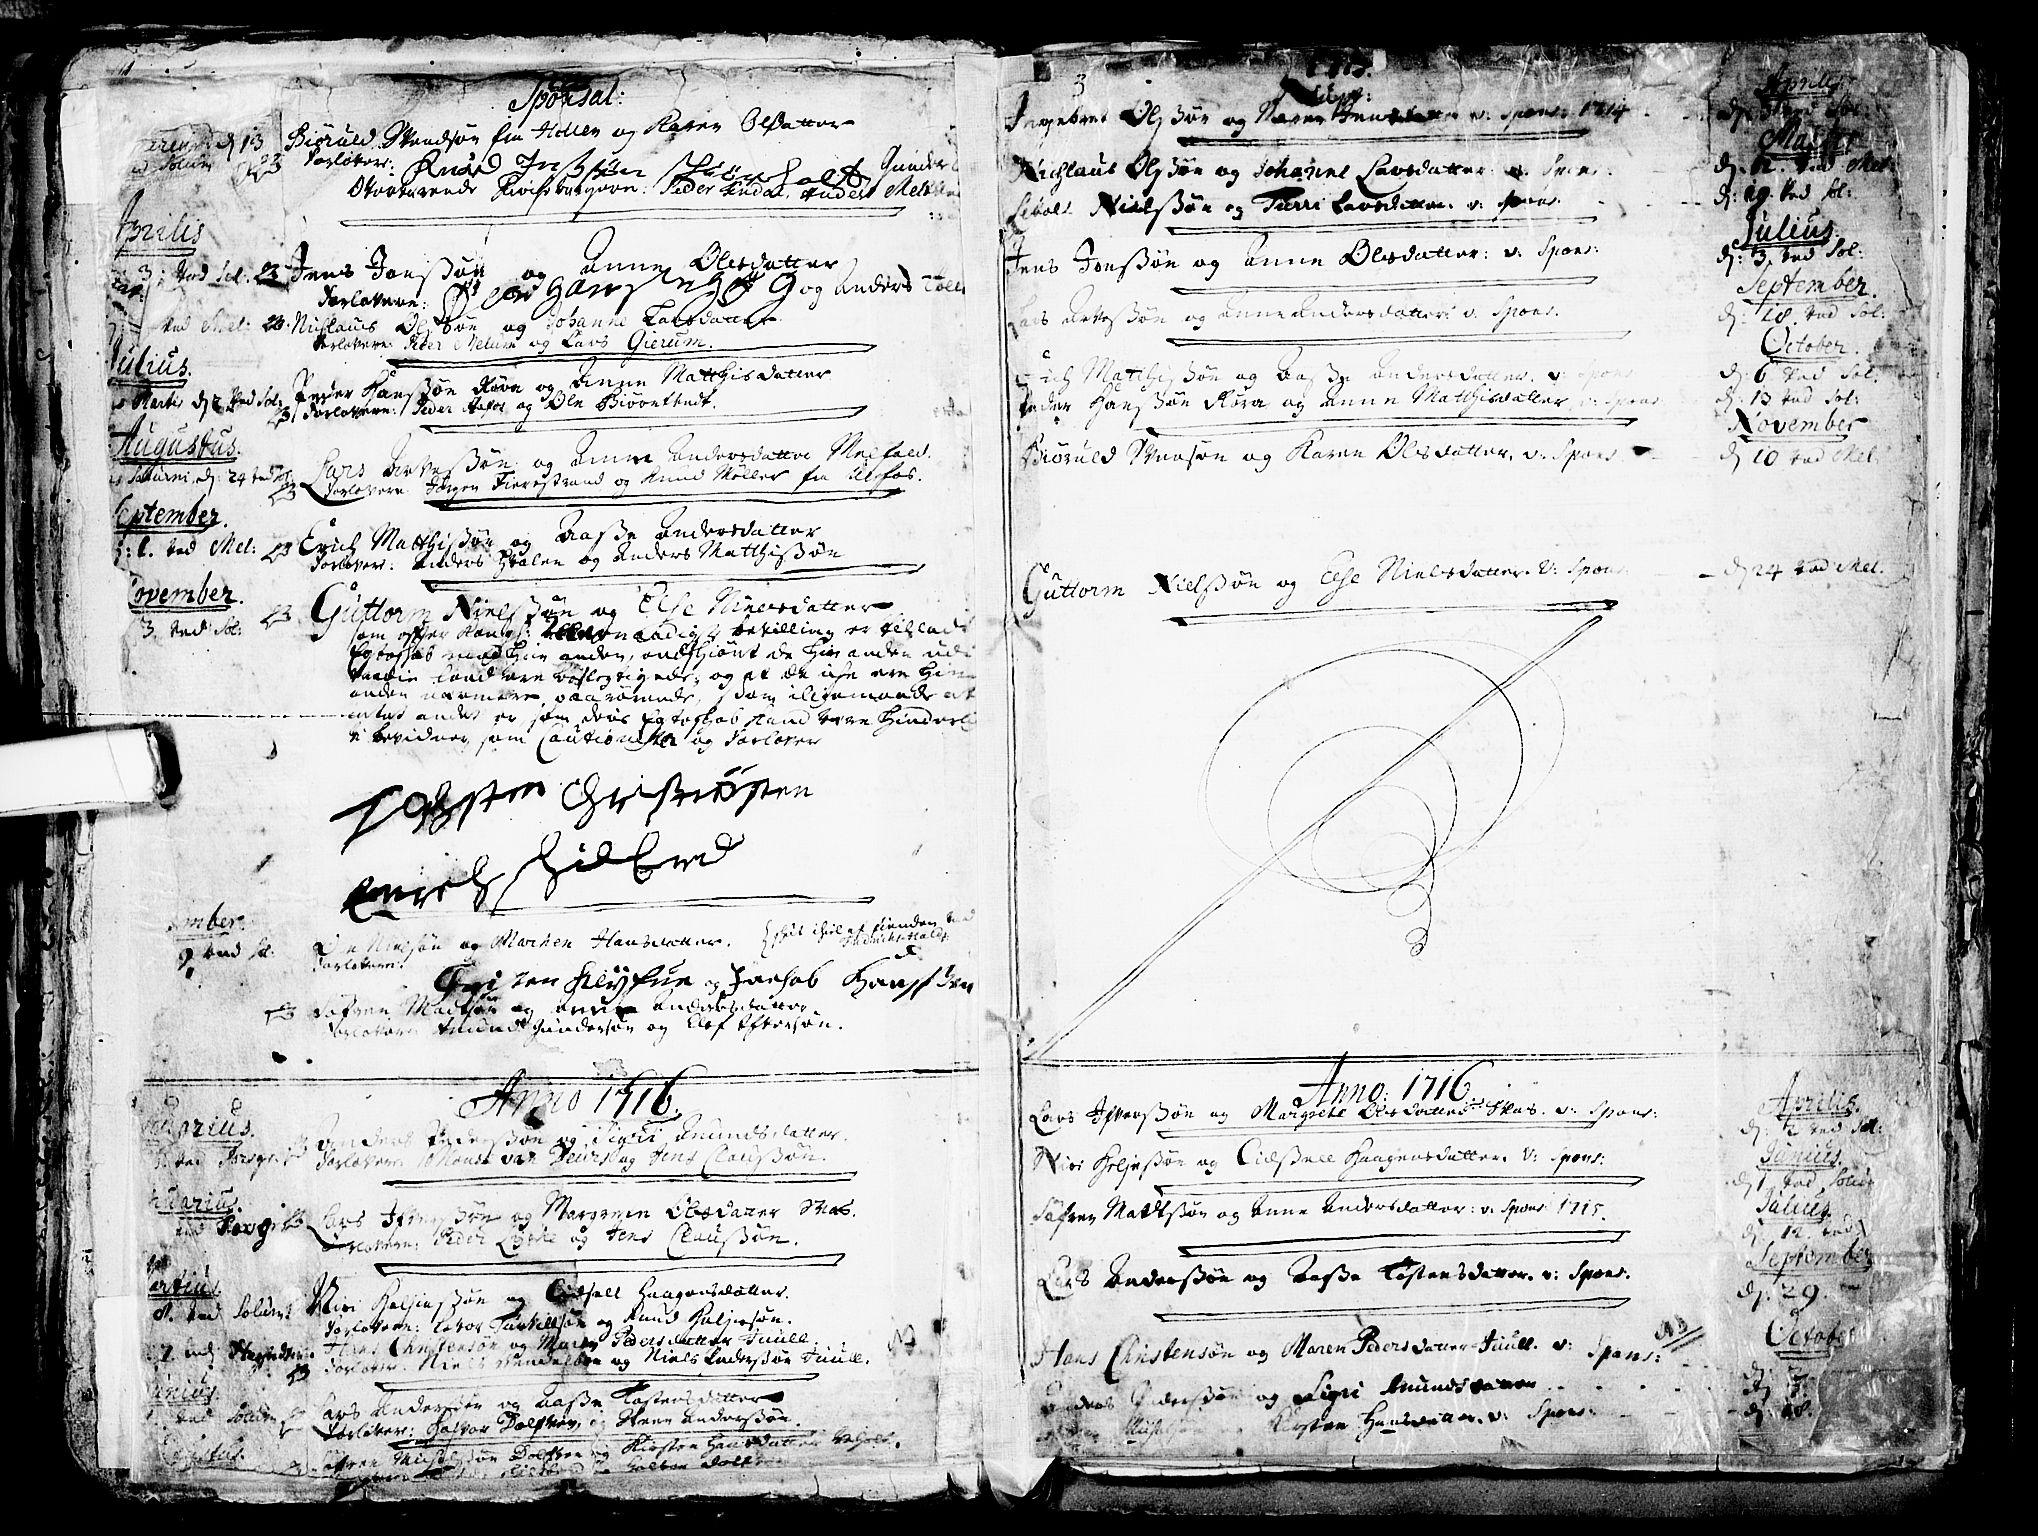 SAKO, Solum kirkebøker, F/Fa/L0002: Ministerialbok nr. I 2, 1713-1761, s. 177